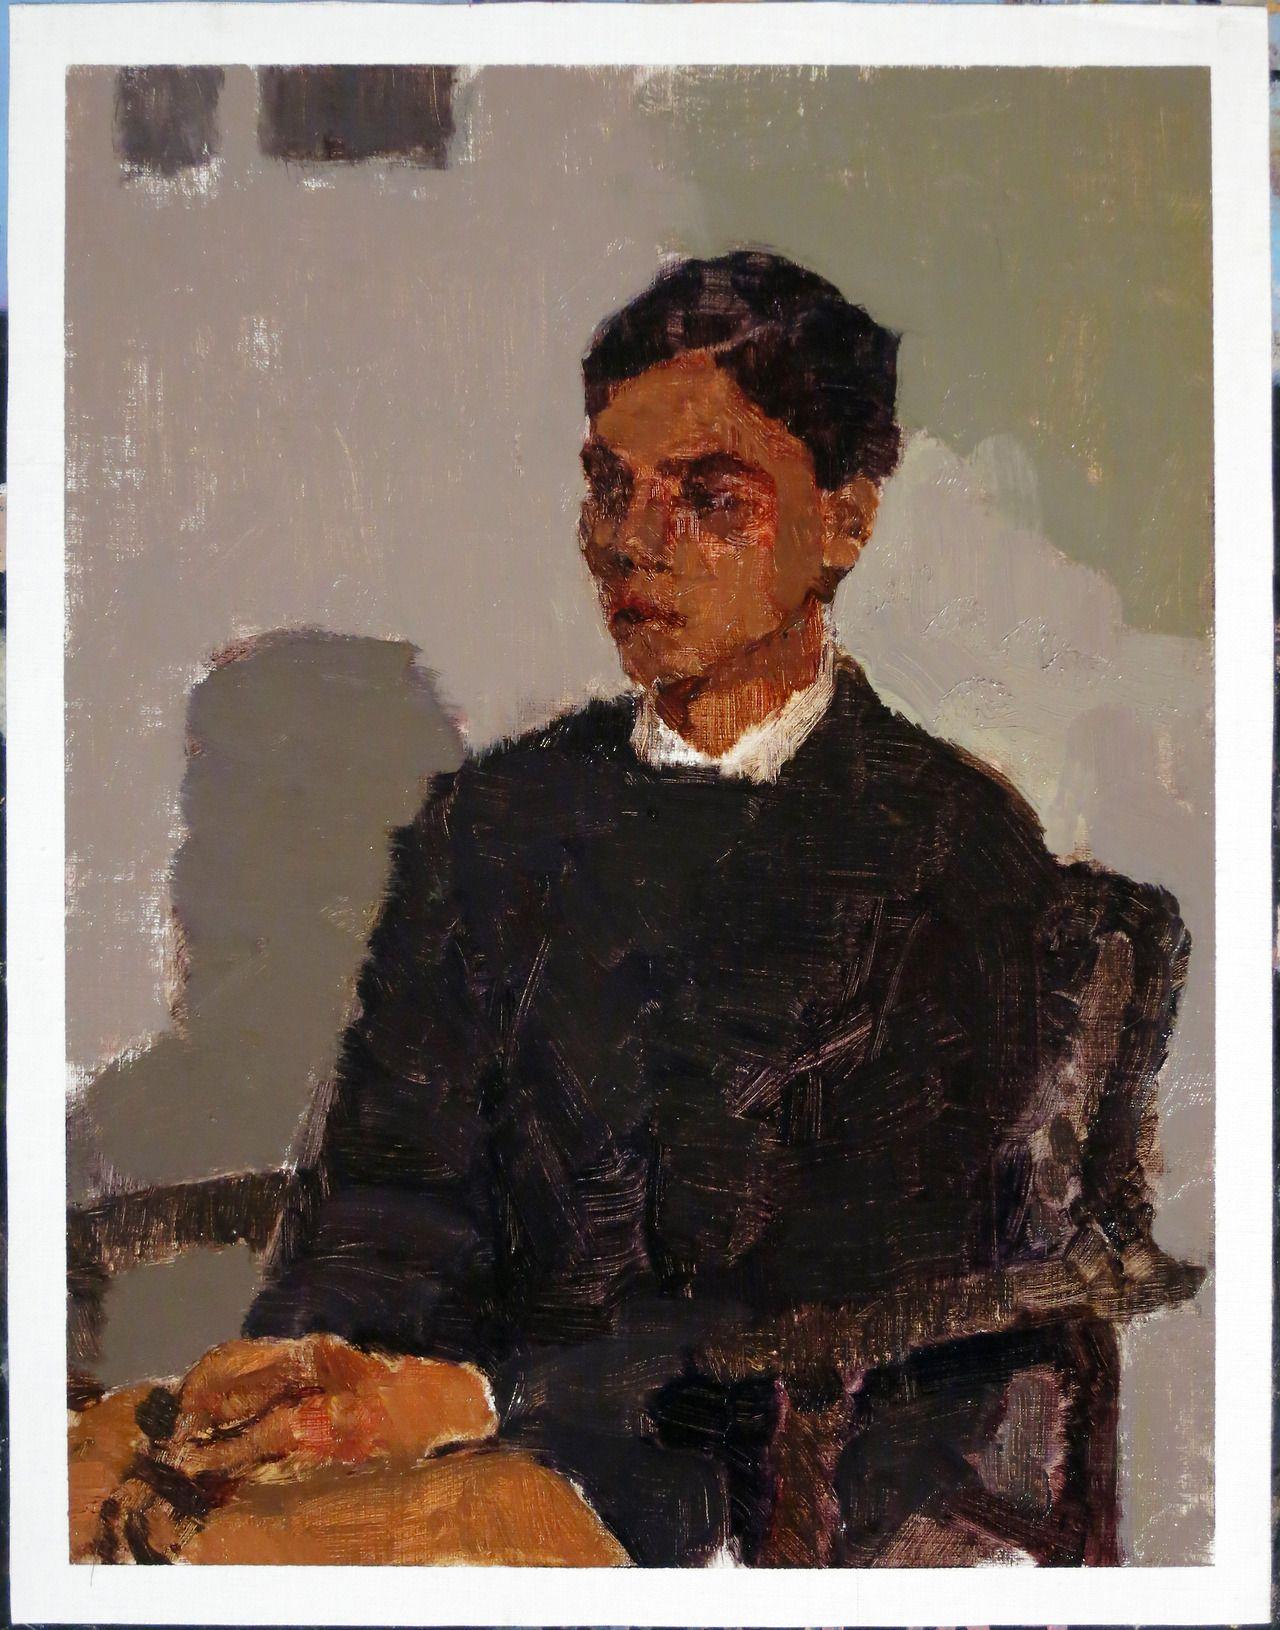 shaheed, or whistler's mother's son, thursday evening. Really good local artist, Ian Grose